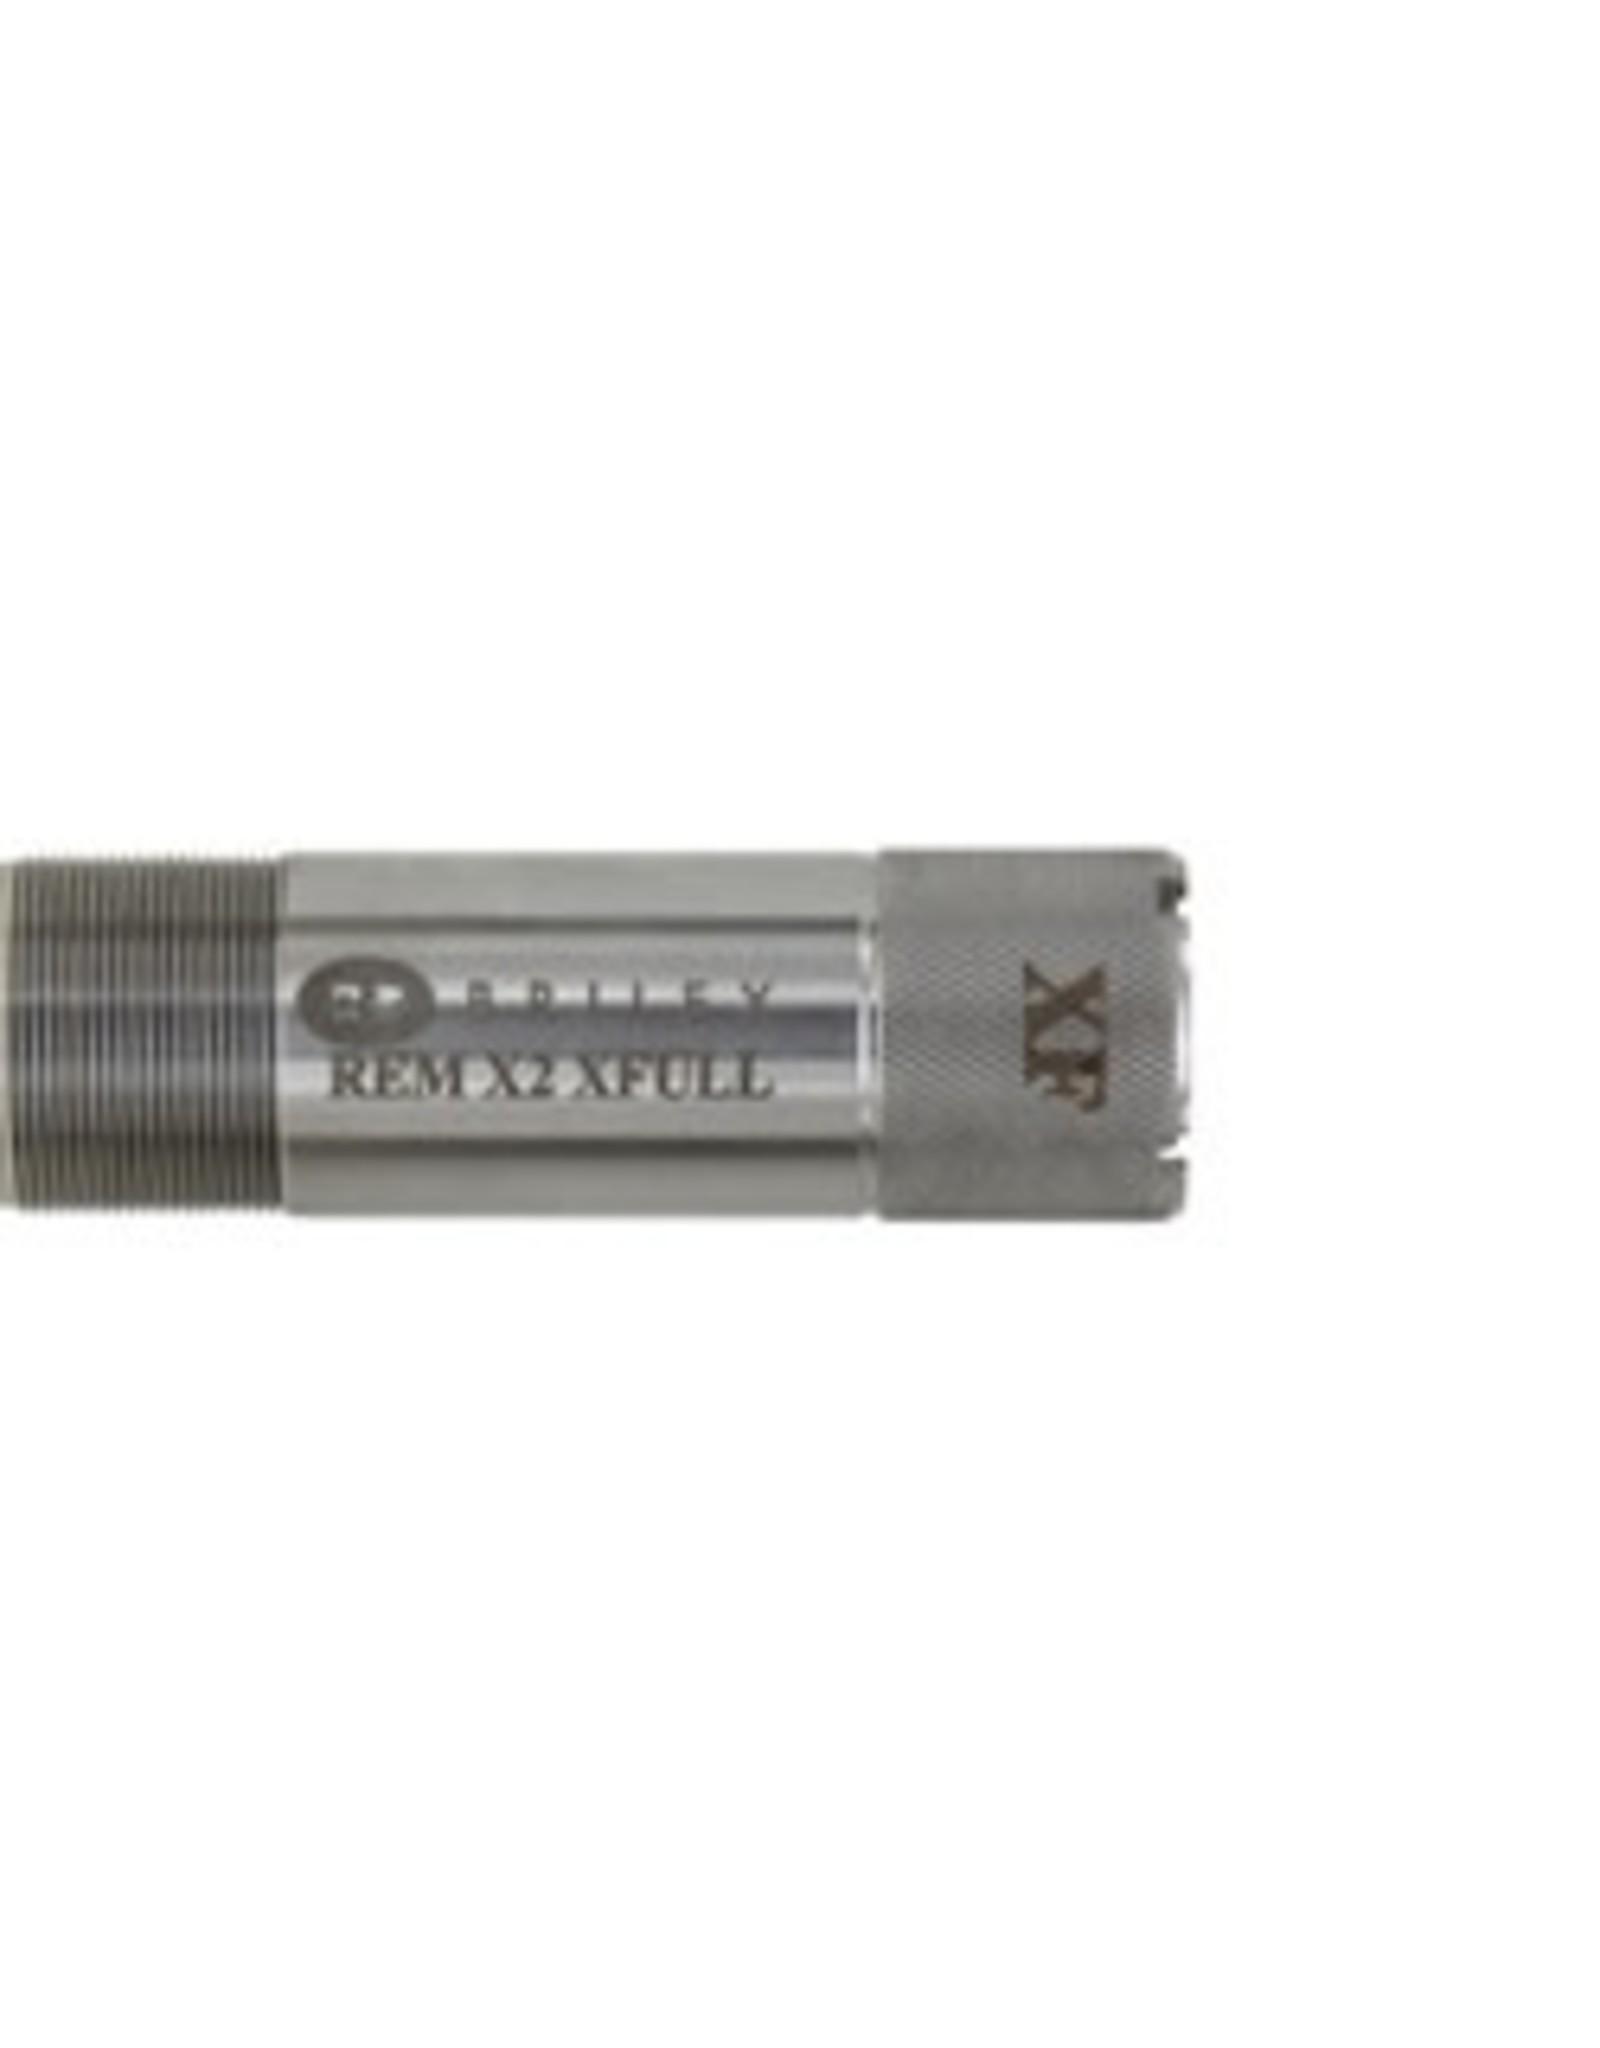 Remington 28ga Ext SS - Improved Cylinder